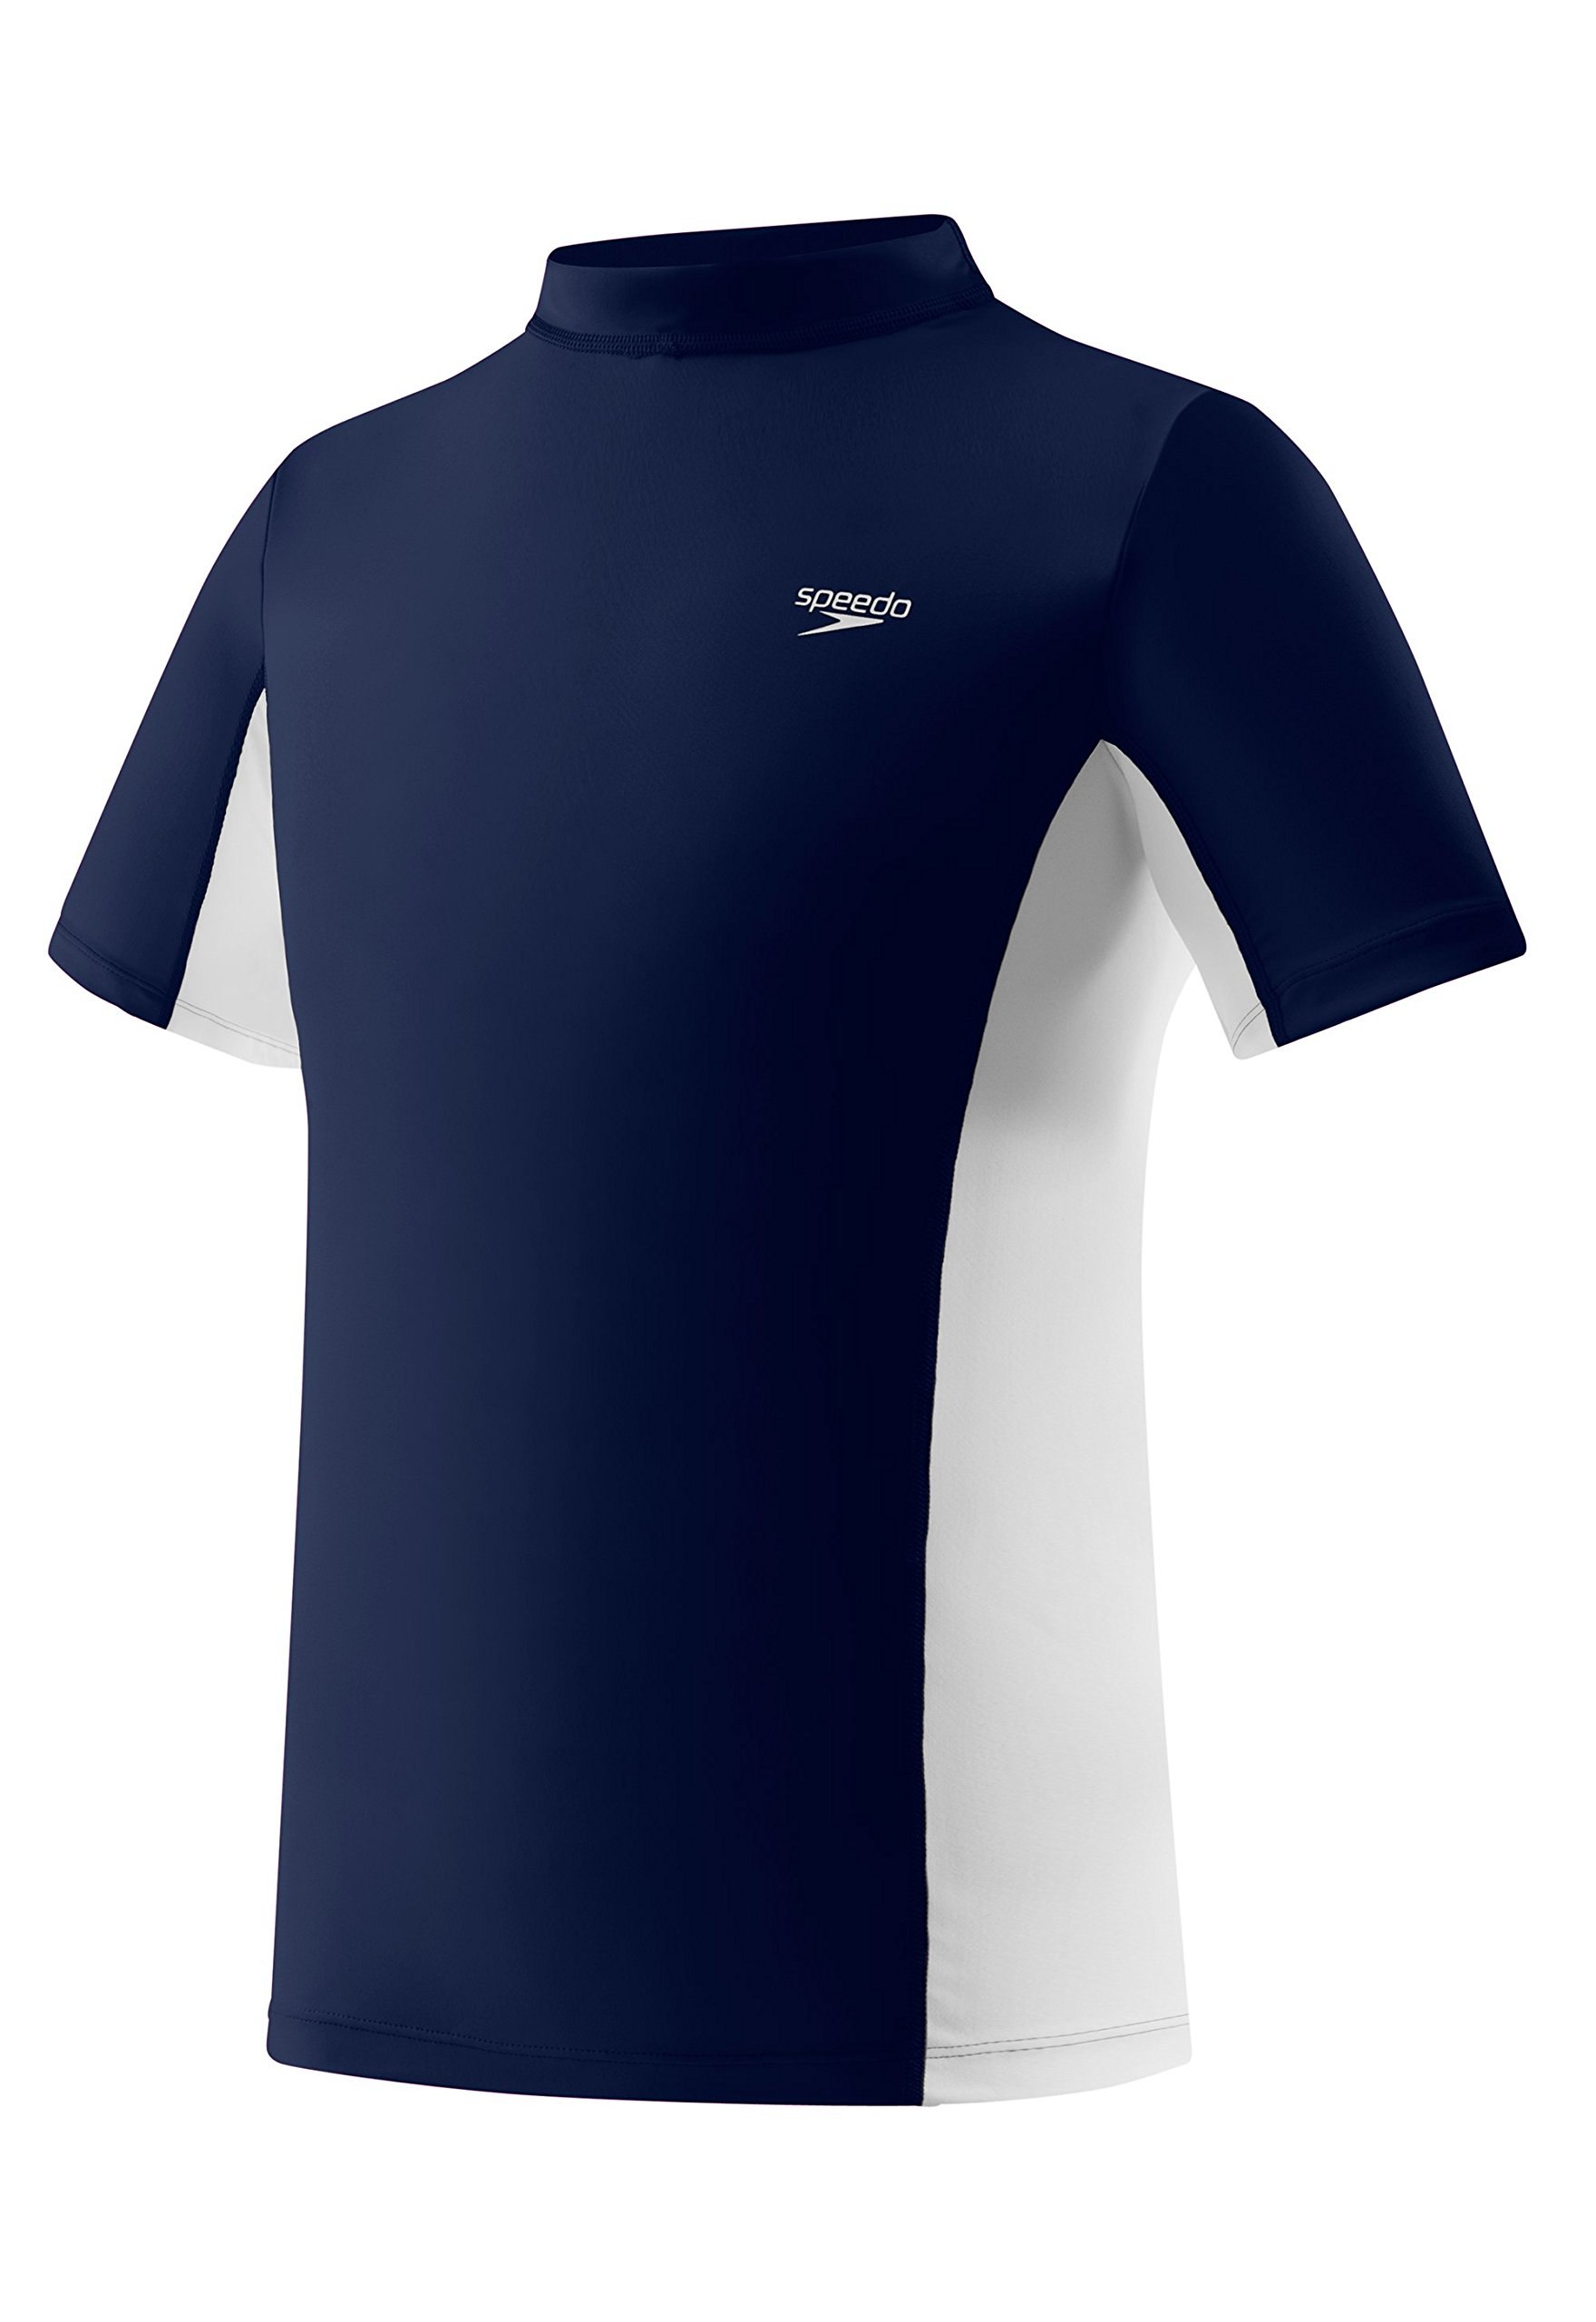 Speedo Big Boys' UV 50 Plus Short Sleeve Rashguard, Deep Water, X-Large by Speedo